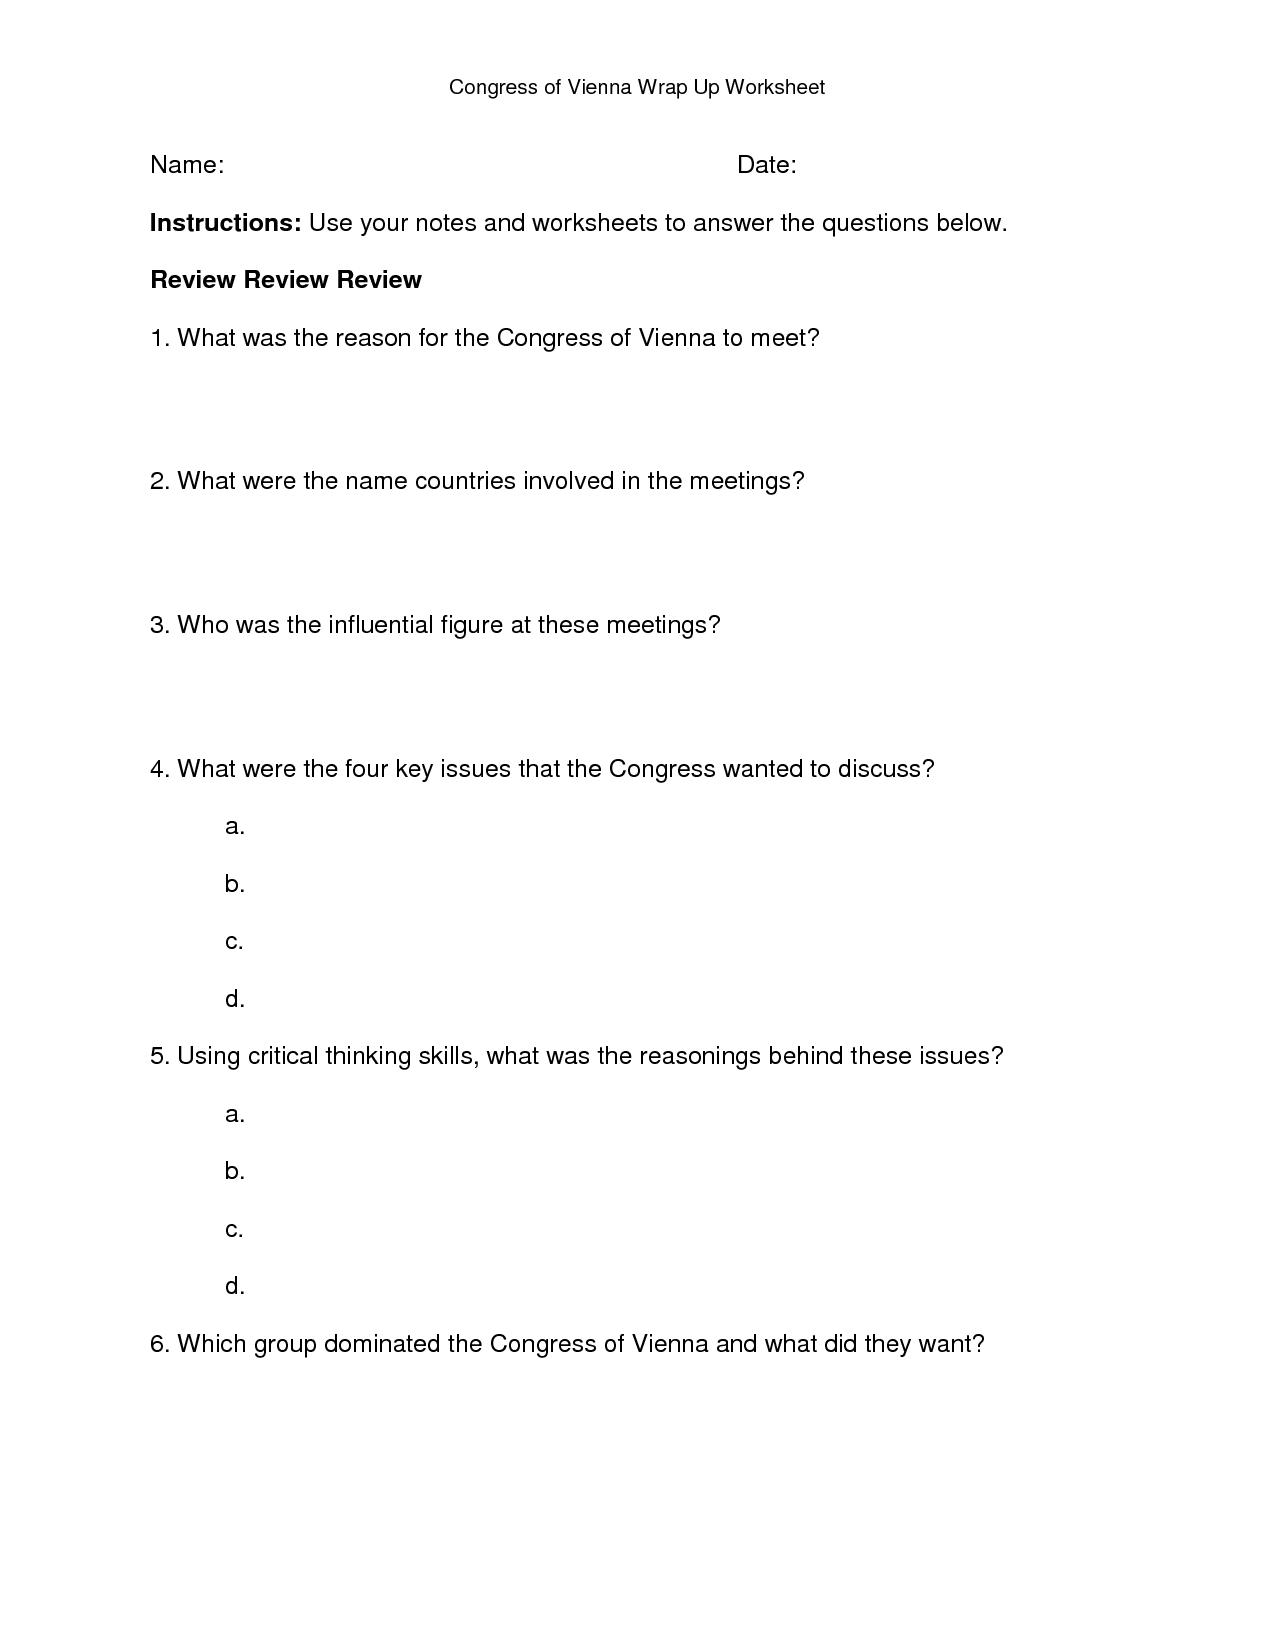 Congress Worksheet Answers